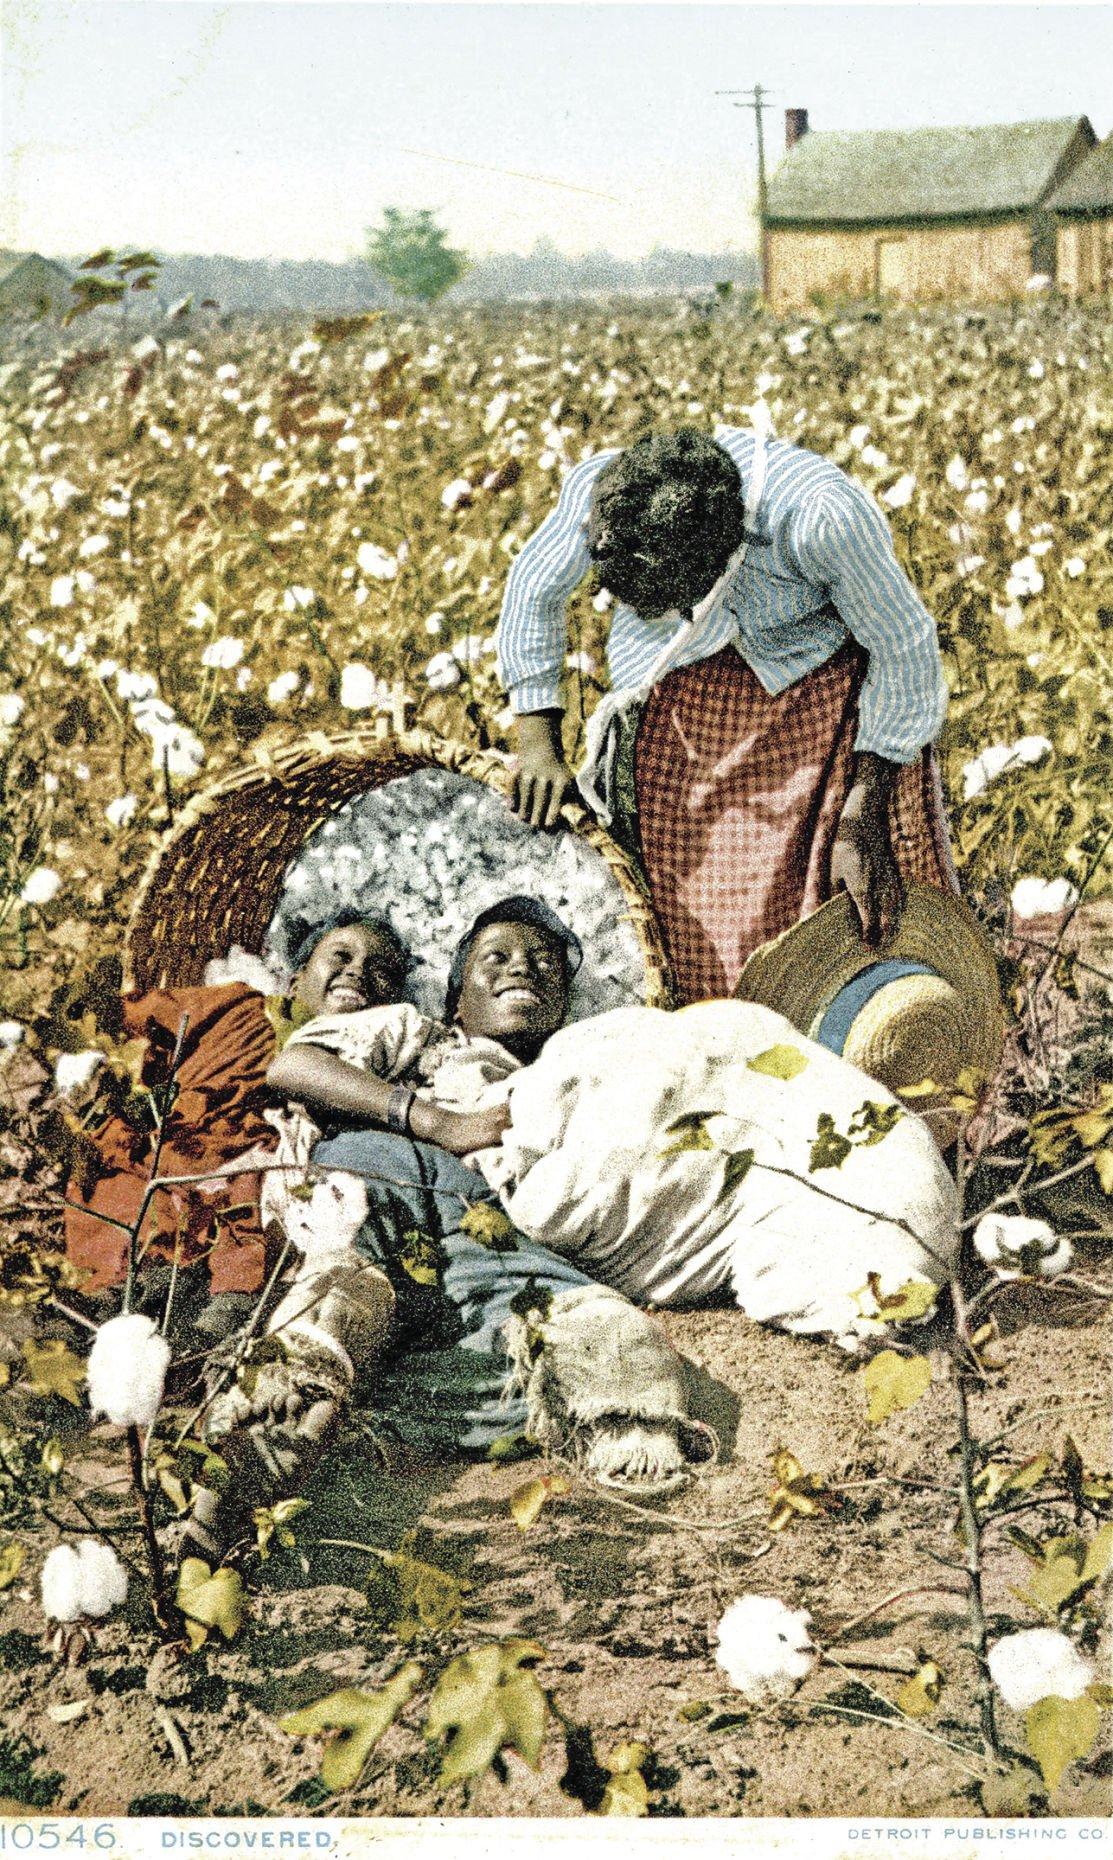 CottonProductionAnish003.jpg